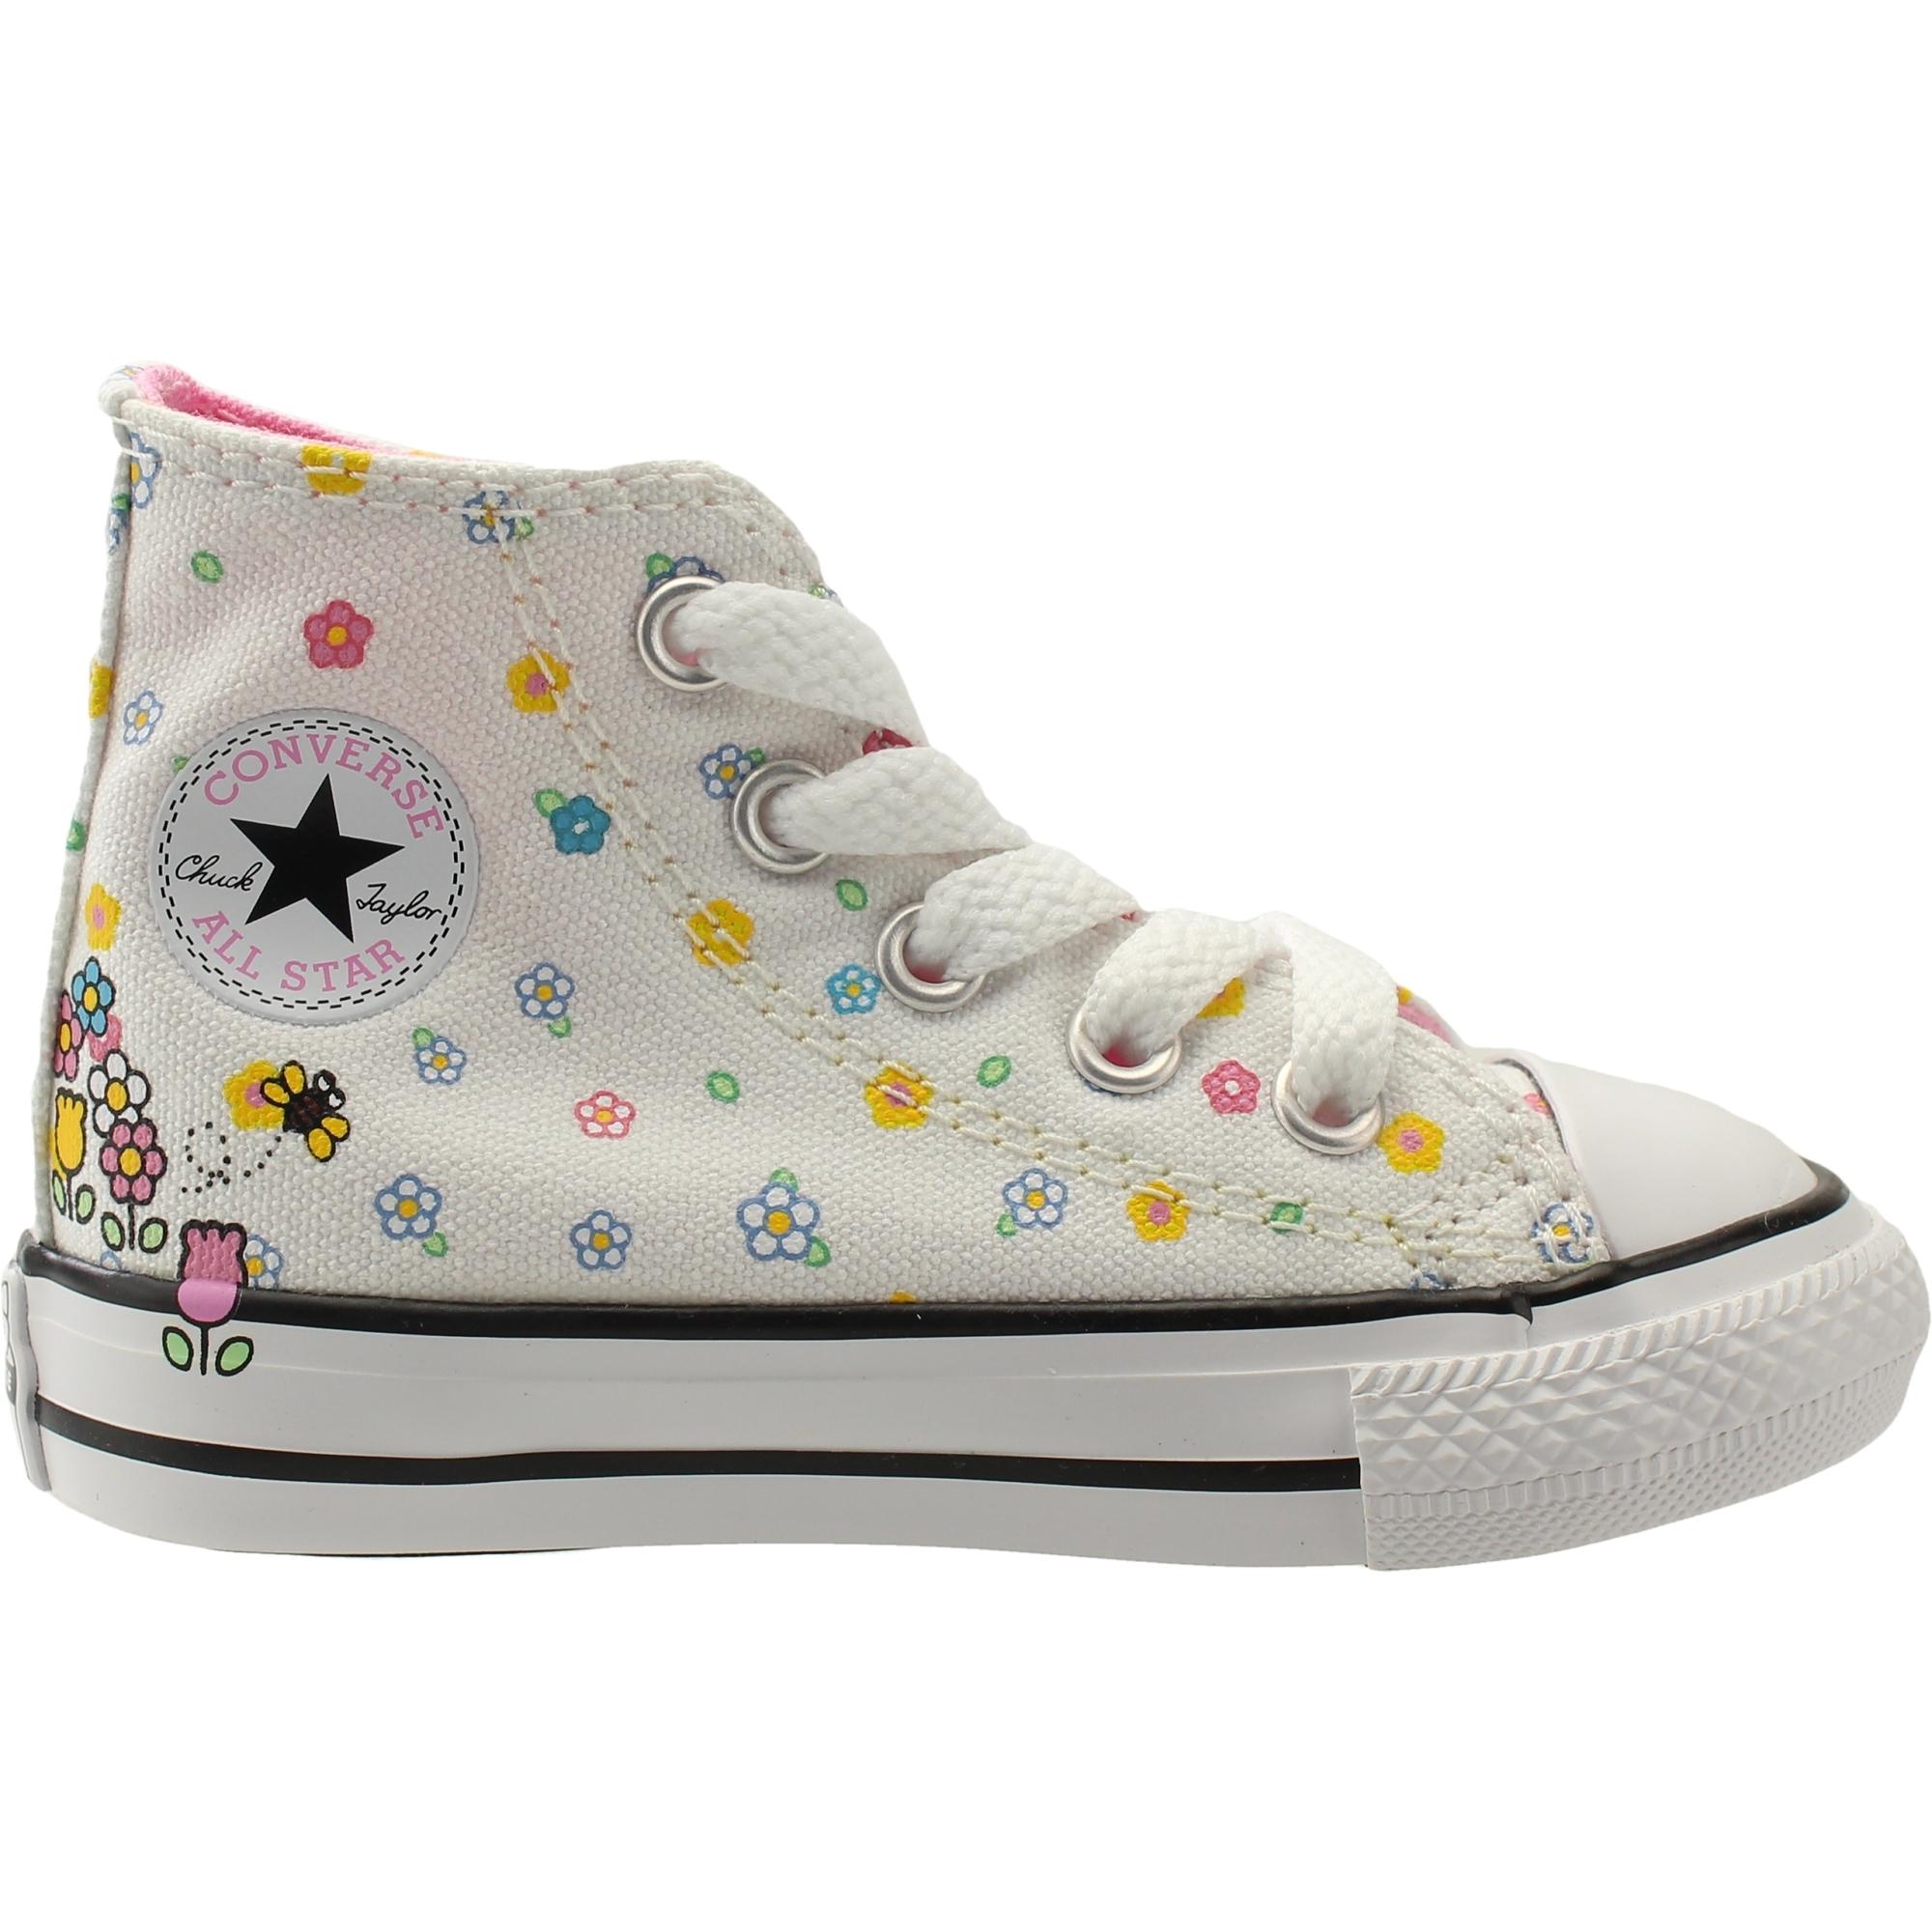 Converse Chuck Taylor All Star Hello Kitty Hi WhitePink Textile Baby